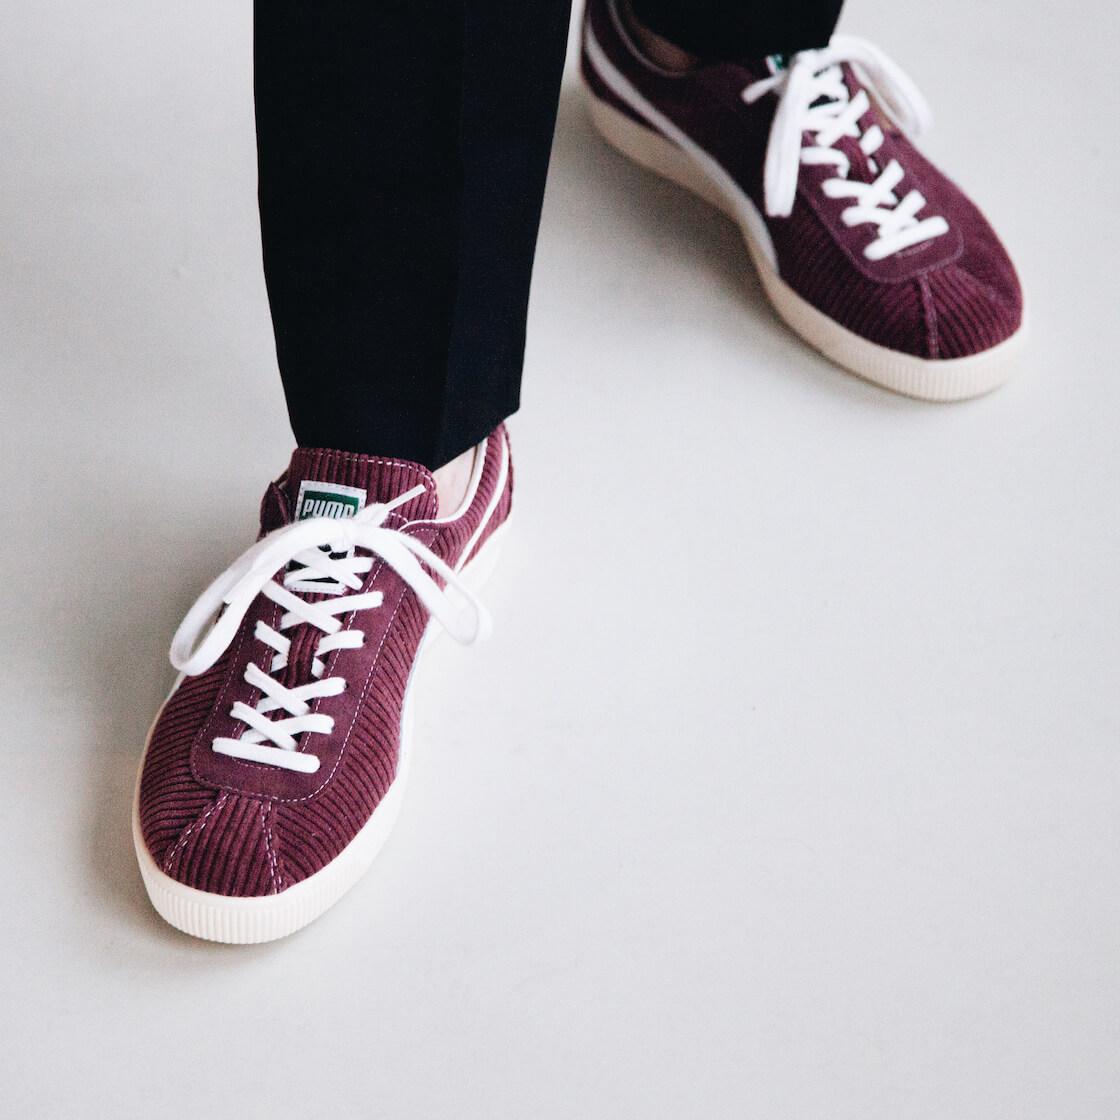 harmony and puma collaboration puma crack shoes